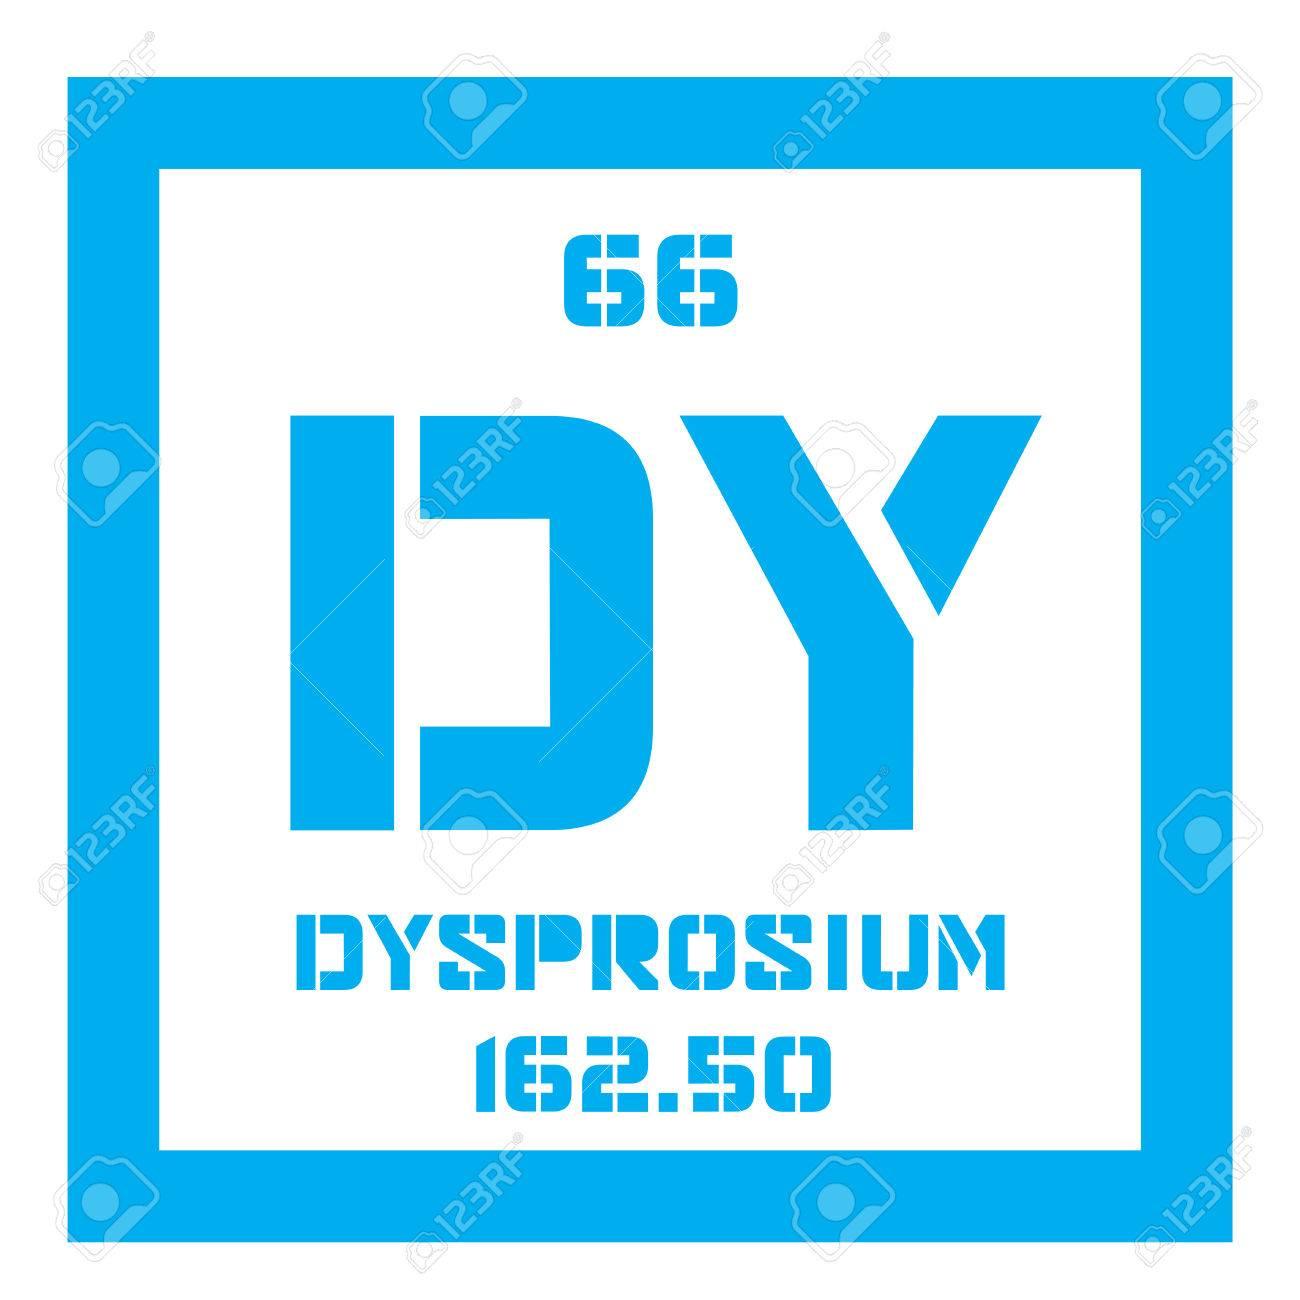 Disprosio elemento qumico elemento de tierras raras icono de disprosio elemento qumico elemento de tierras raras icono de color con el nmero atmico urtaz Choice Image